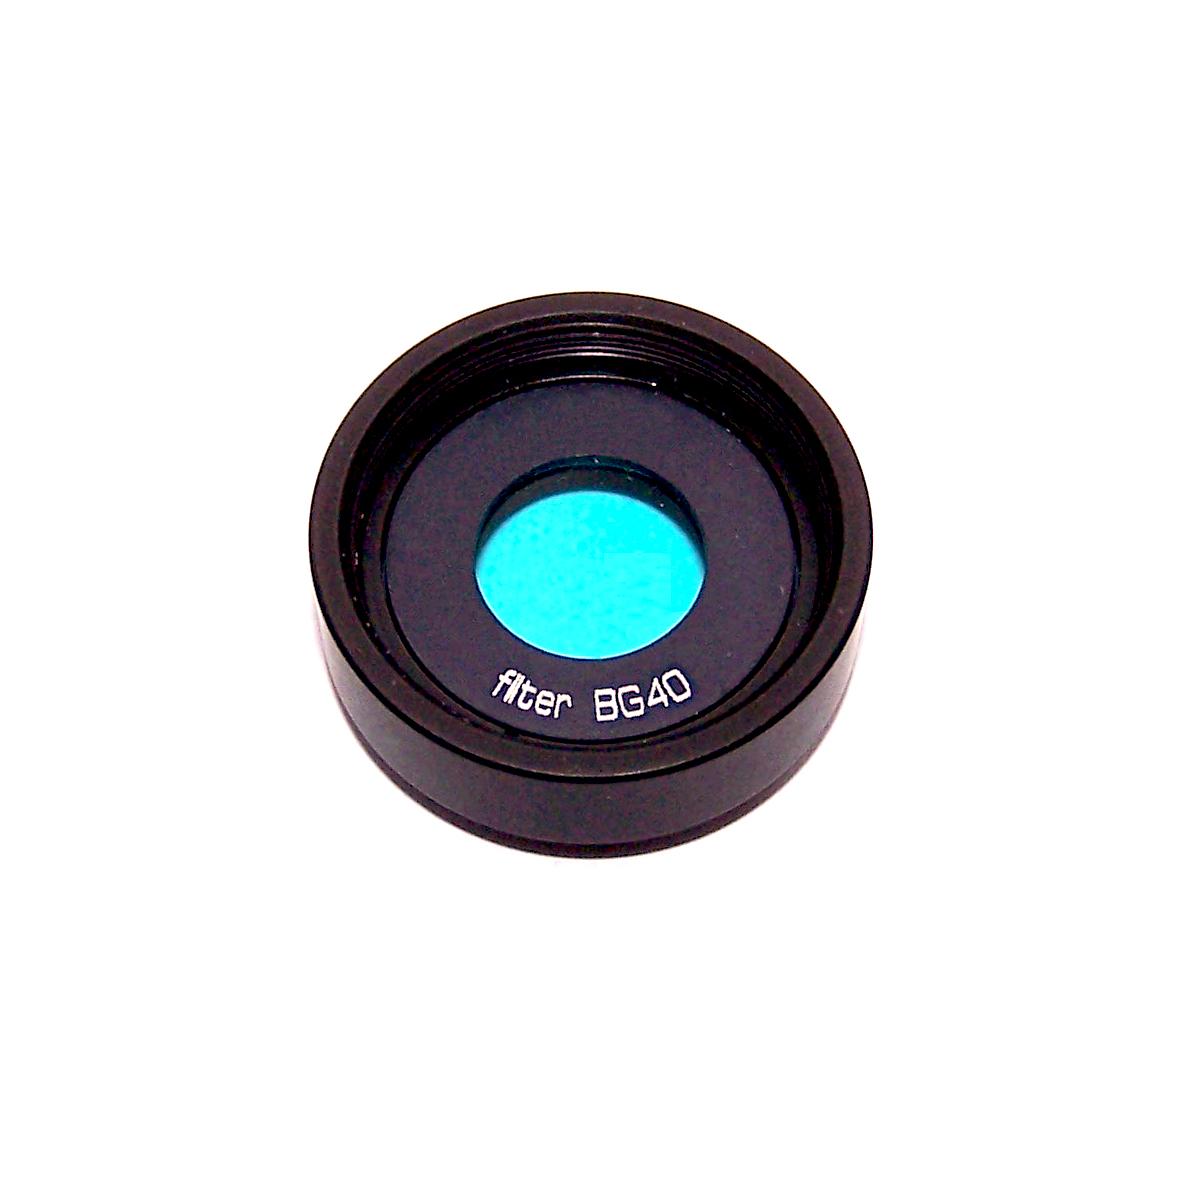 Filter Bg40 1017874 Komlas Optische Komponenten